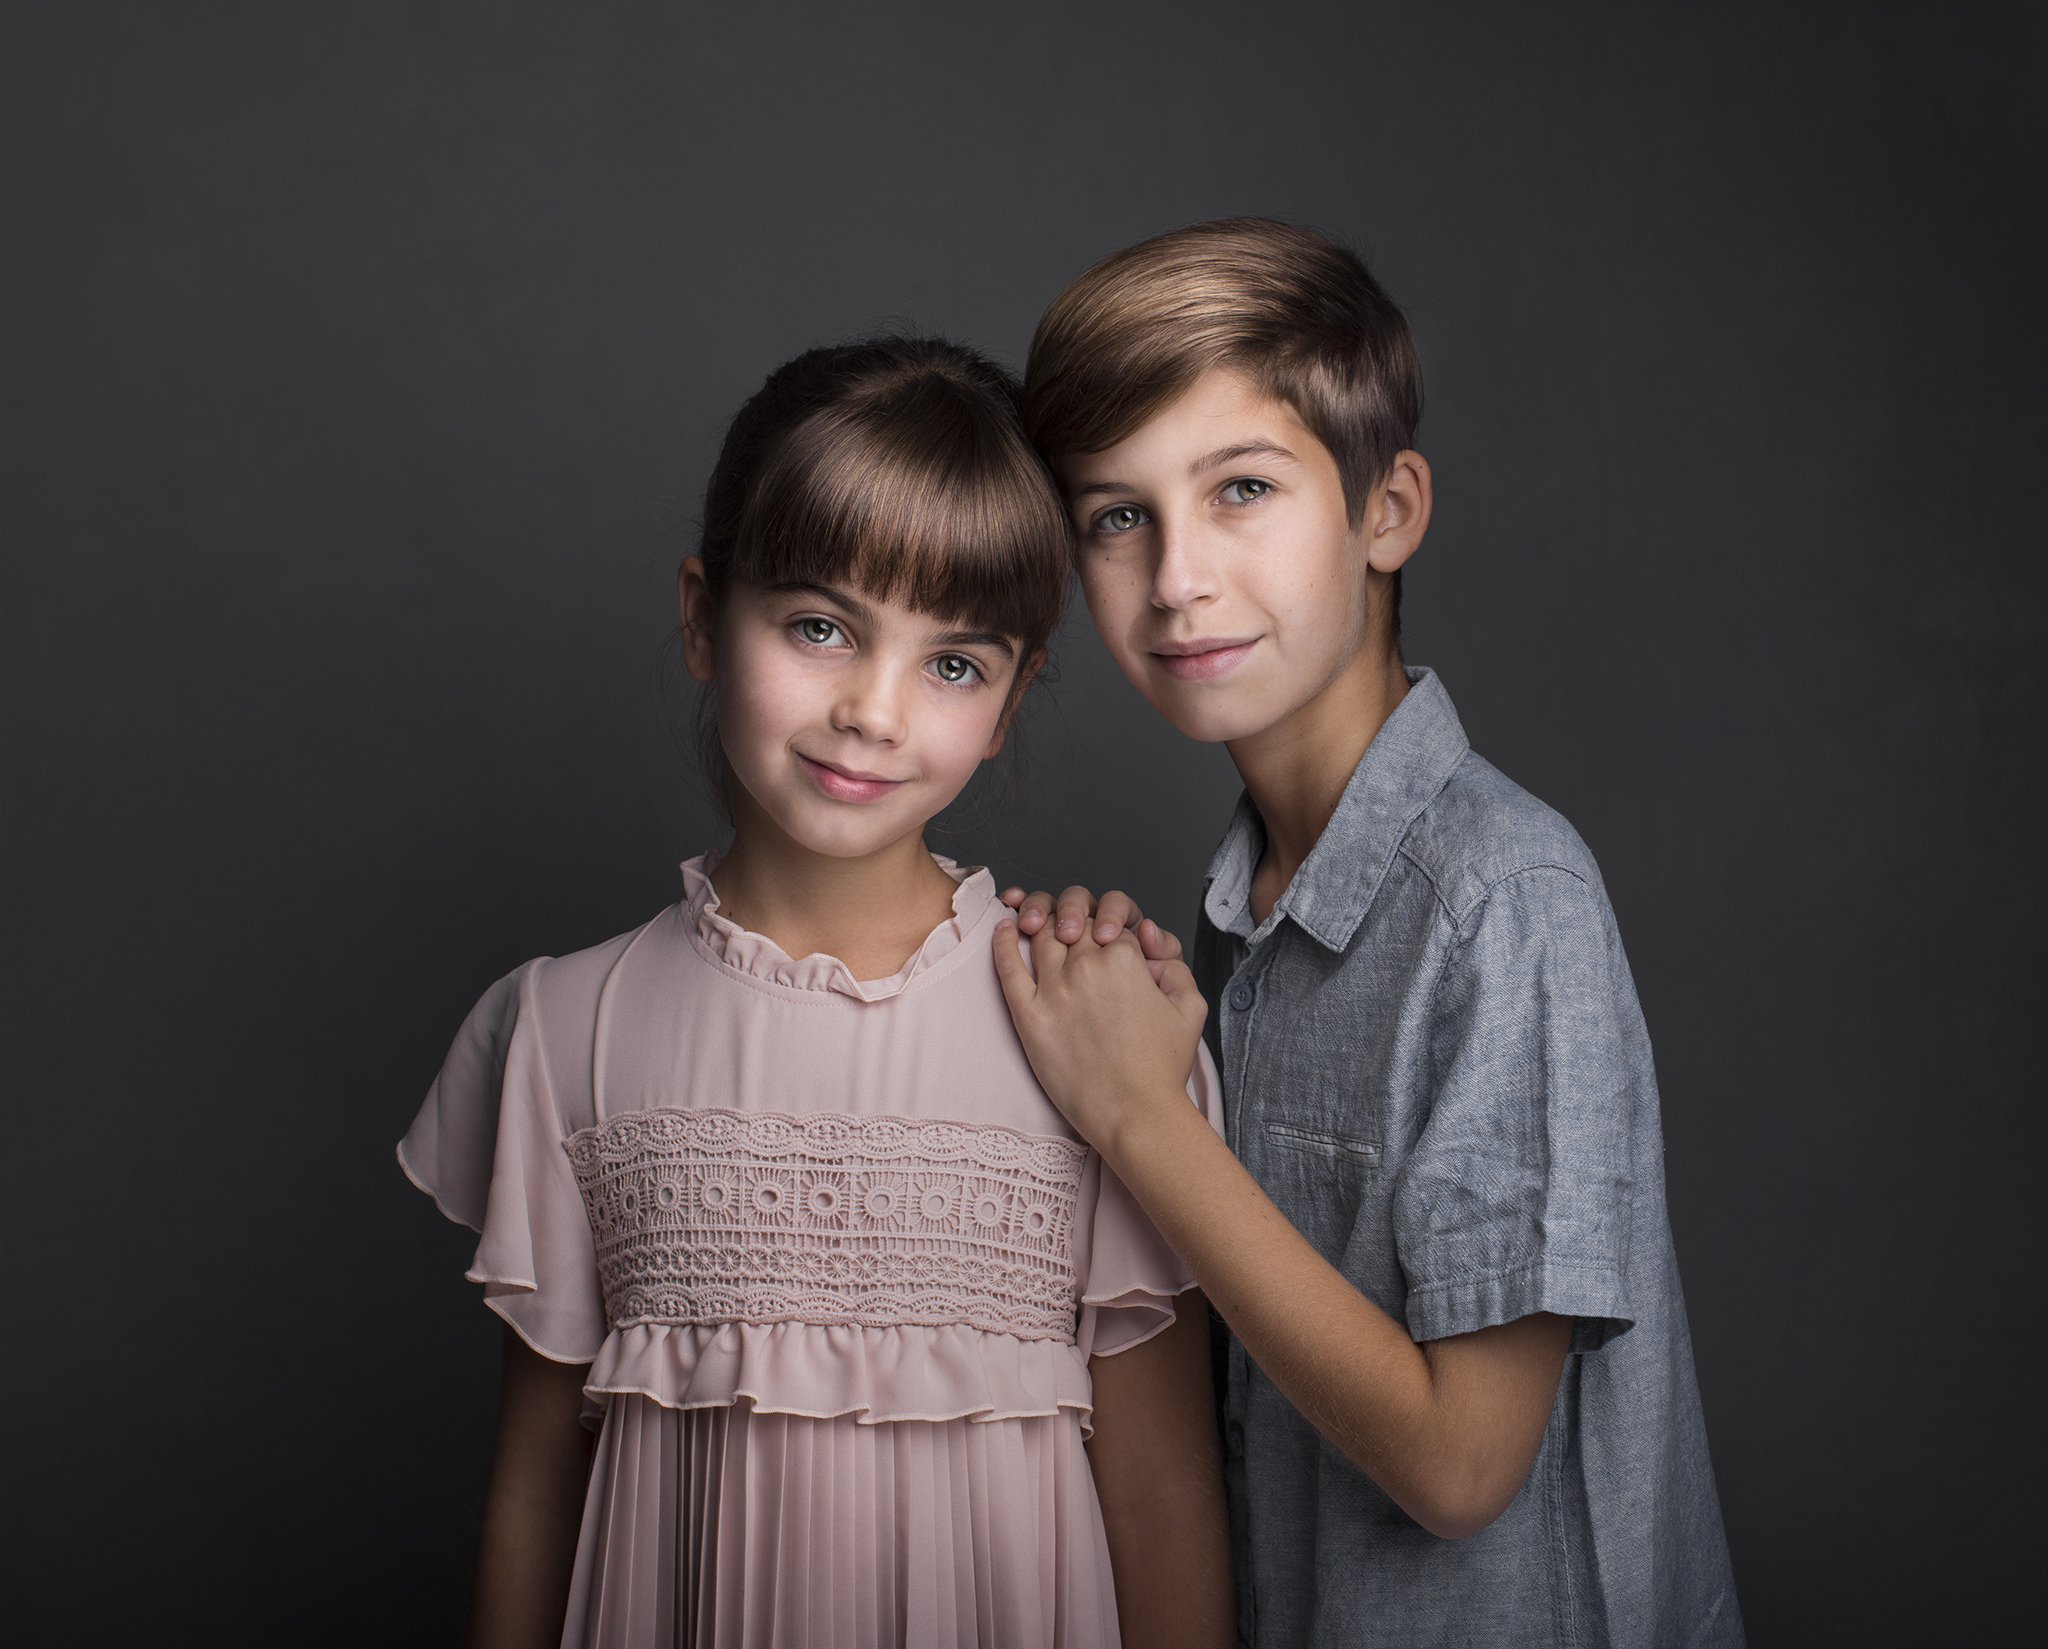 elizabethgfineartphotography_kingslangley_model_actor_chloe_alex1_family_portrait3.jpg